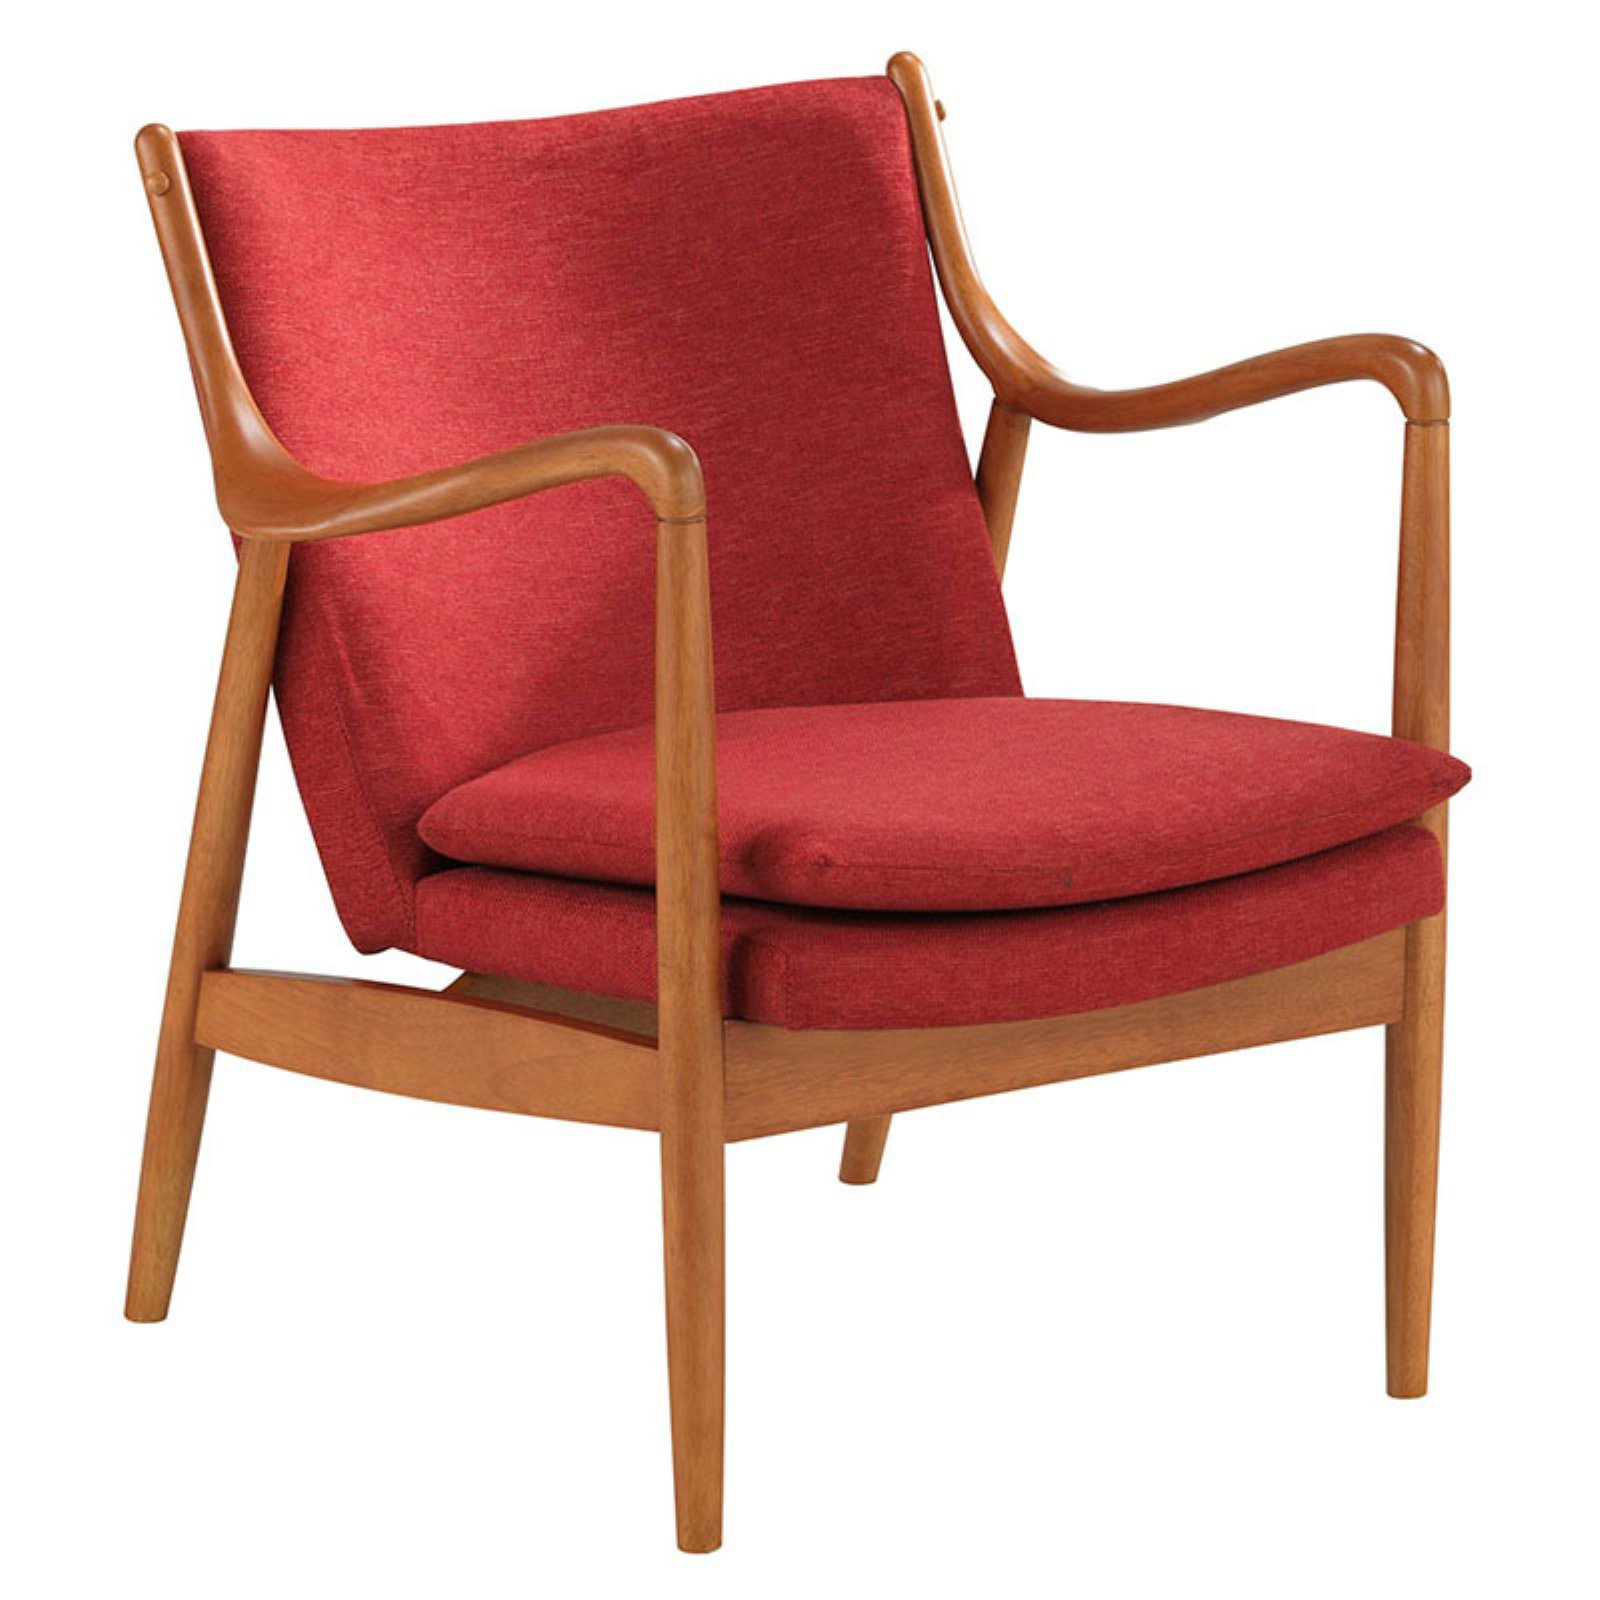 Patrick Mid Century Accent Chair: Baxton Studio Shakespeare Mid-Century Modern Retro Red